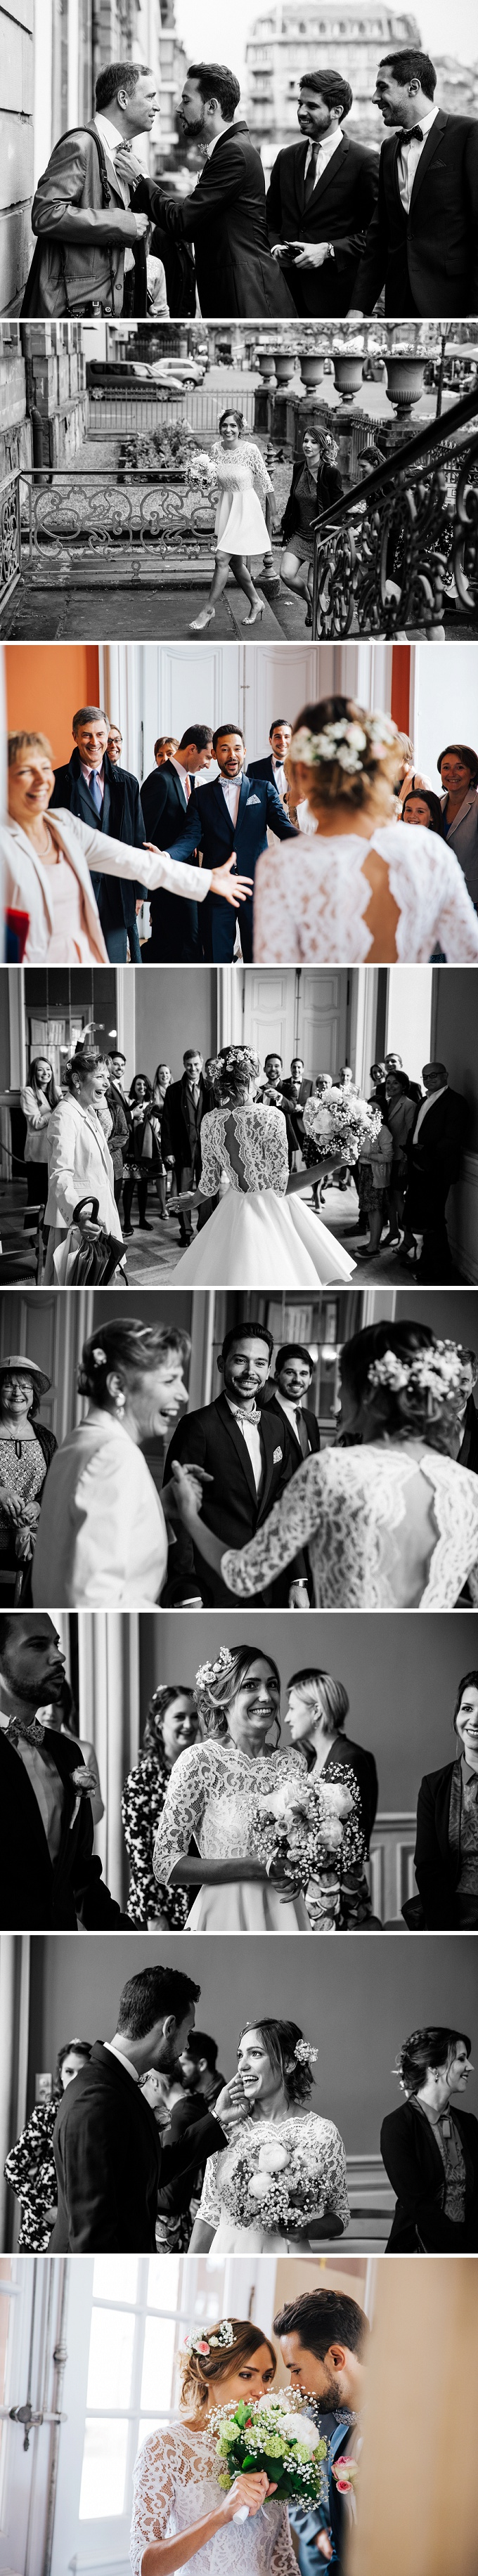 mariage-chateau-dosthoffen-004.jpg